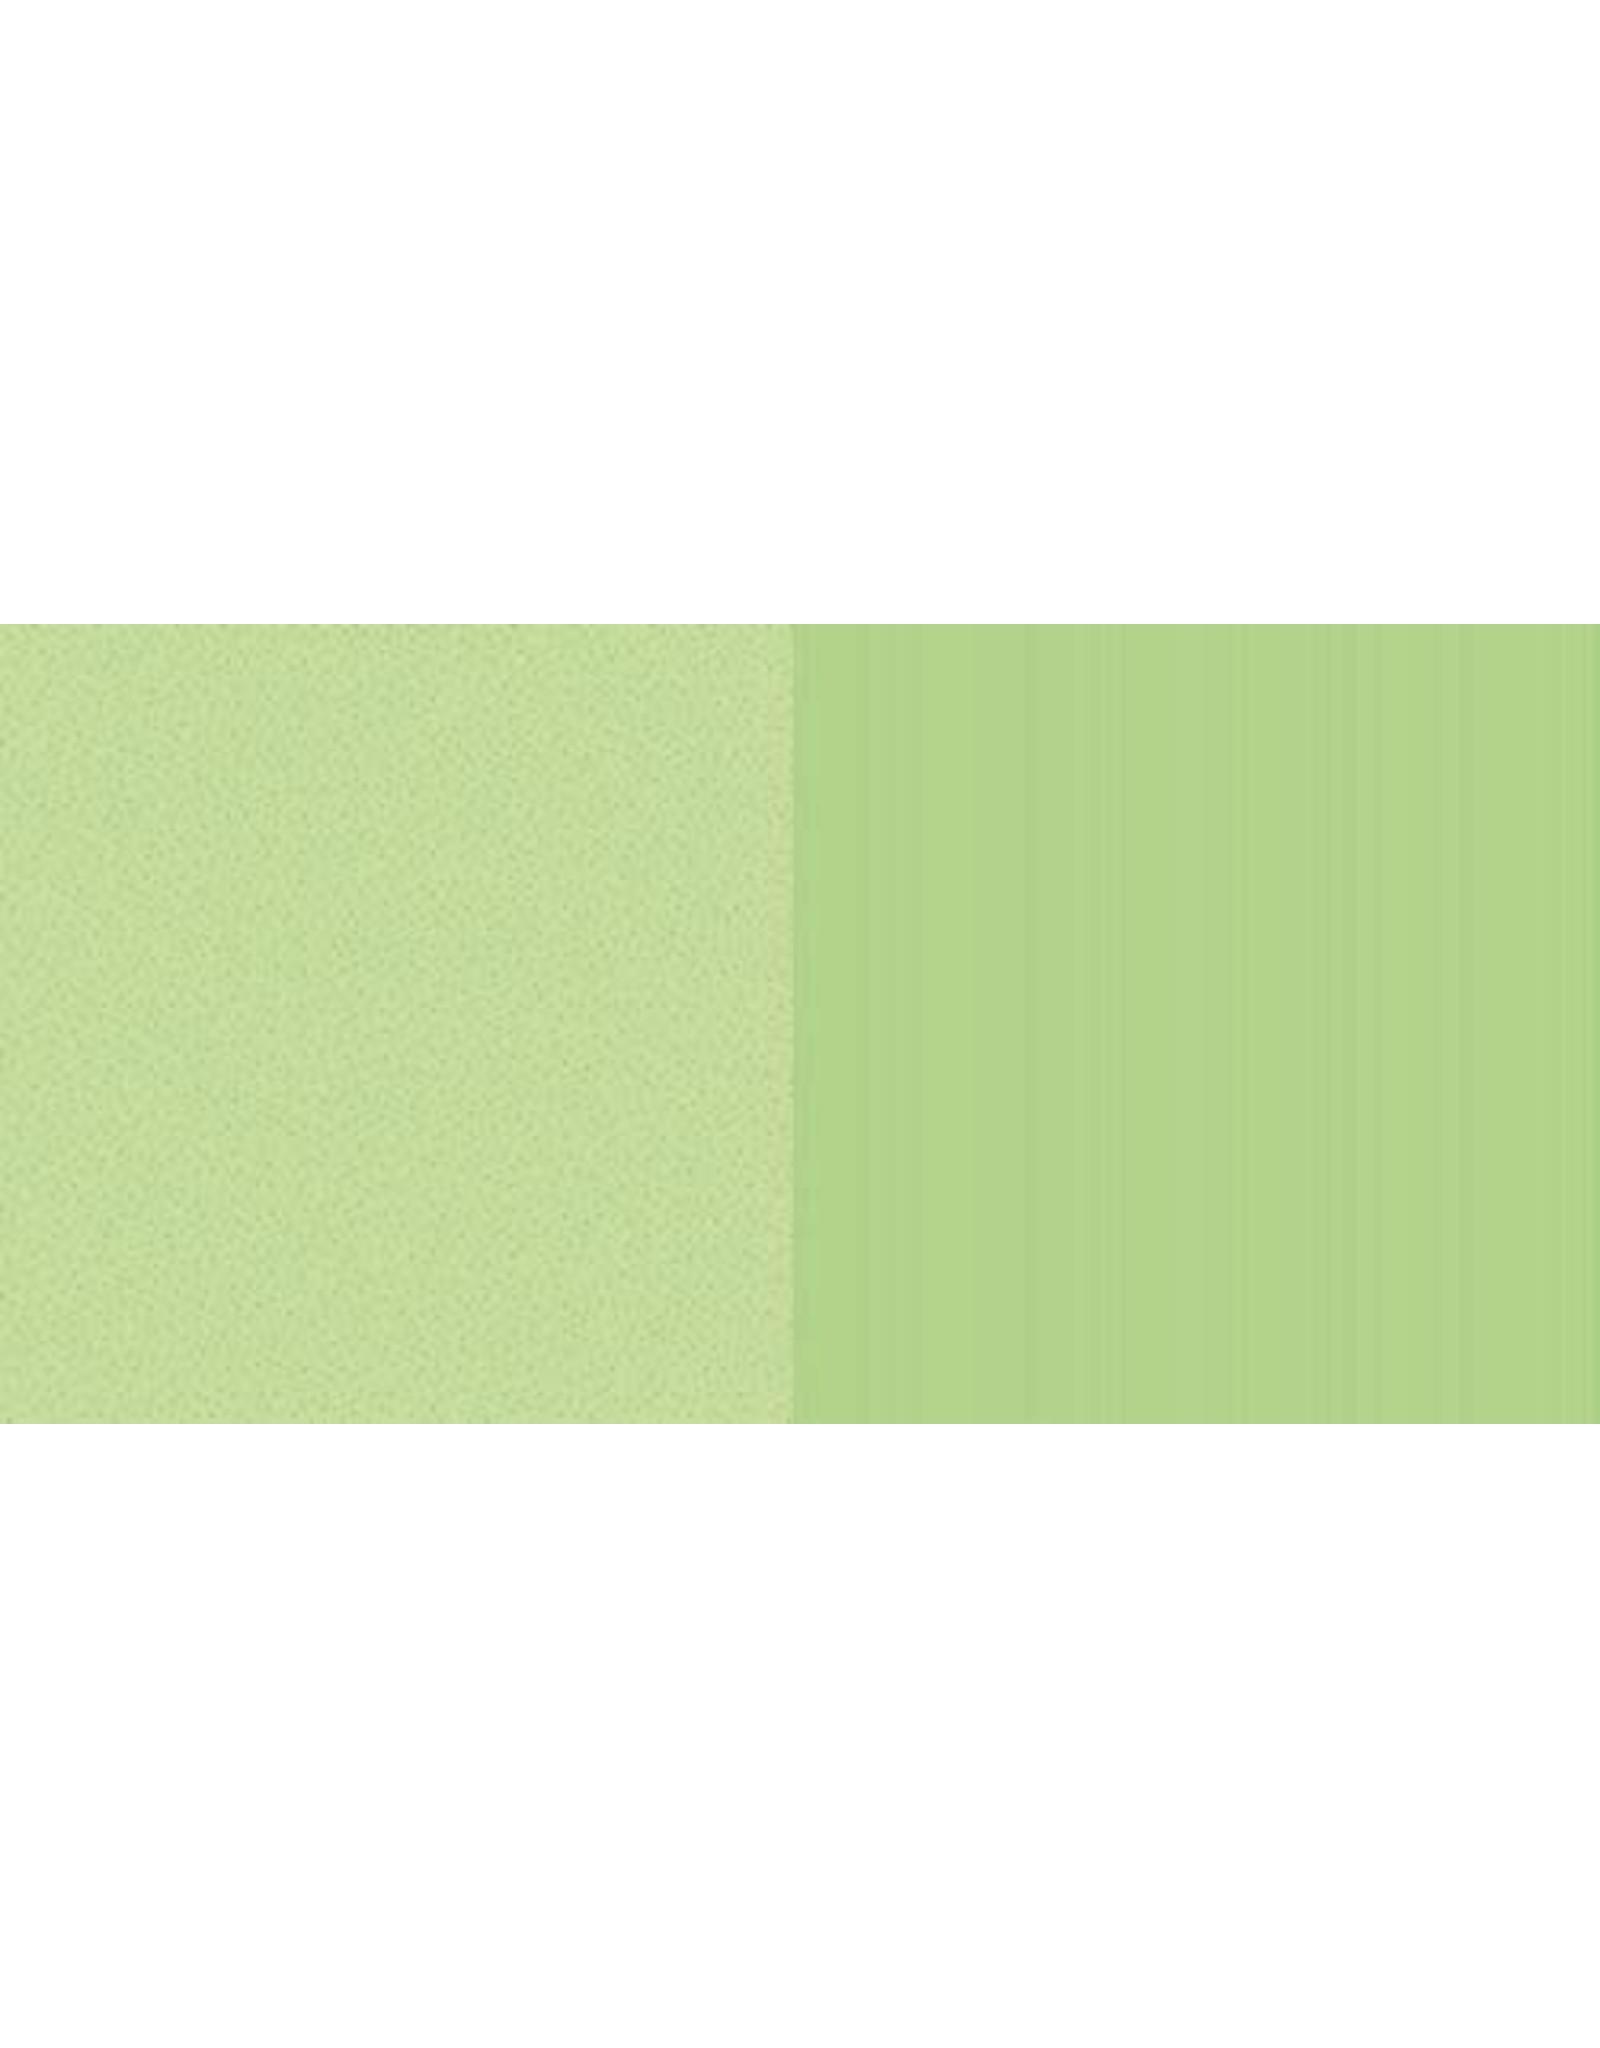 Dini Design Dini Design Scrappapier 10 vl Streep ster - Lime groen 30,5x30,5cm #1003